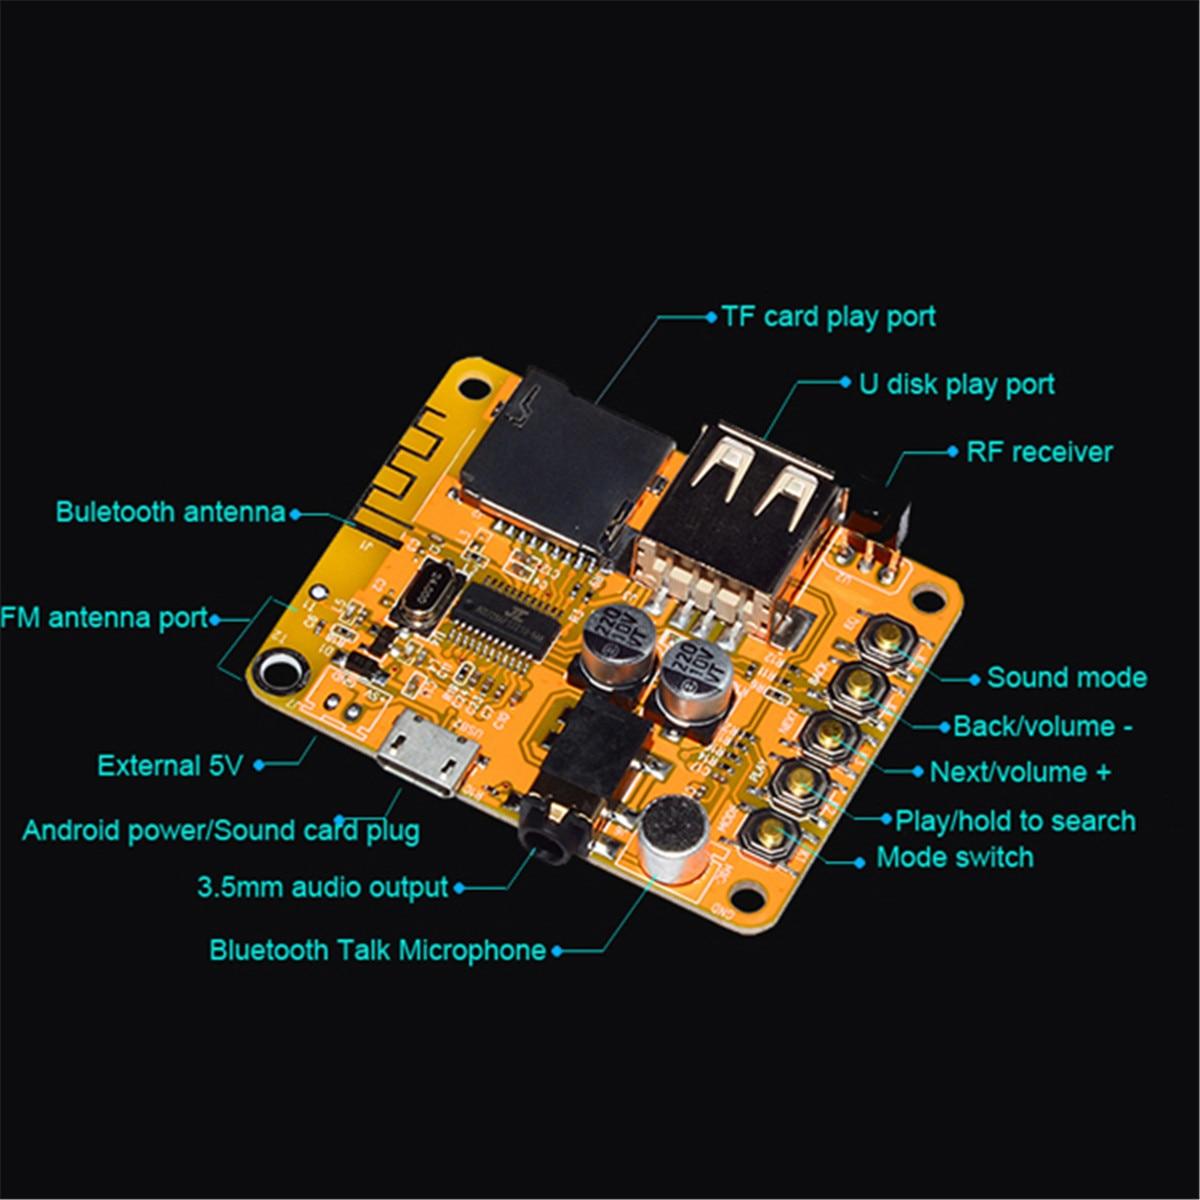 US $10 36 37% OFF|LEORY Remote APP Control bluetooth 4 2 Wireless Modular  Receiver Board Audio Amplifier Board Antenna for MP3/WMA/WAV-in Wireless